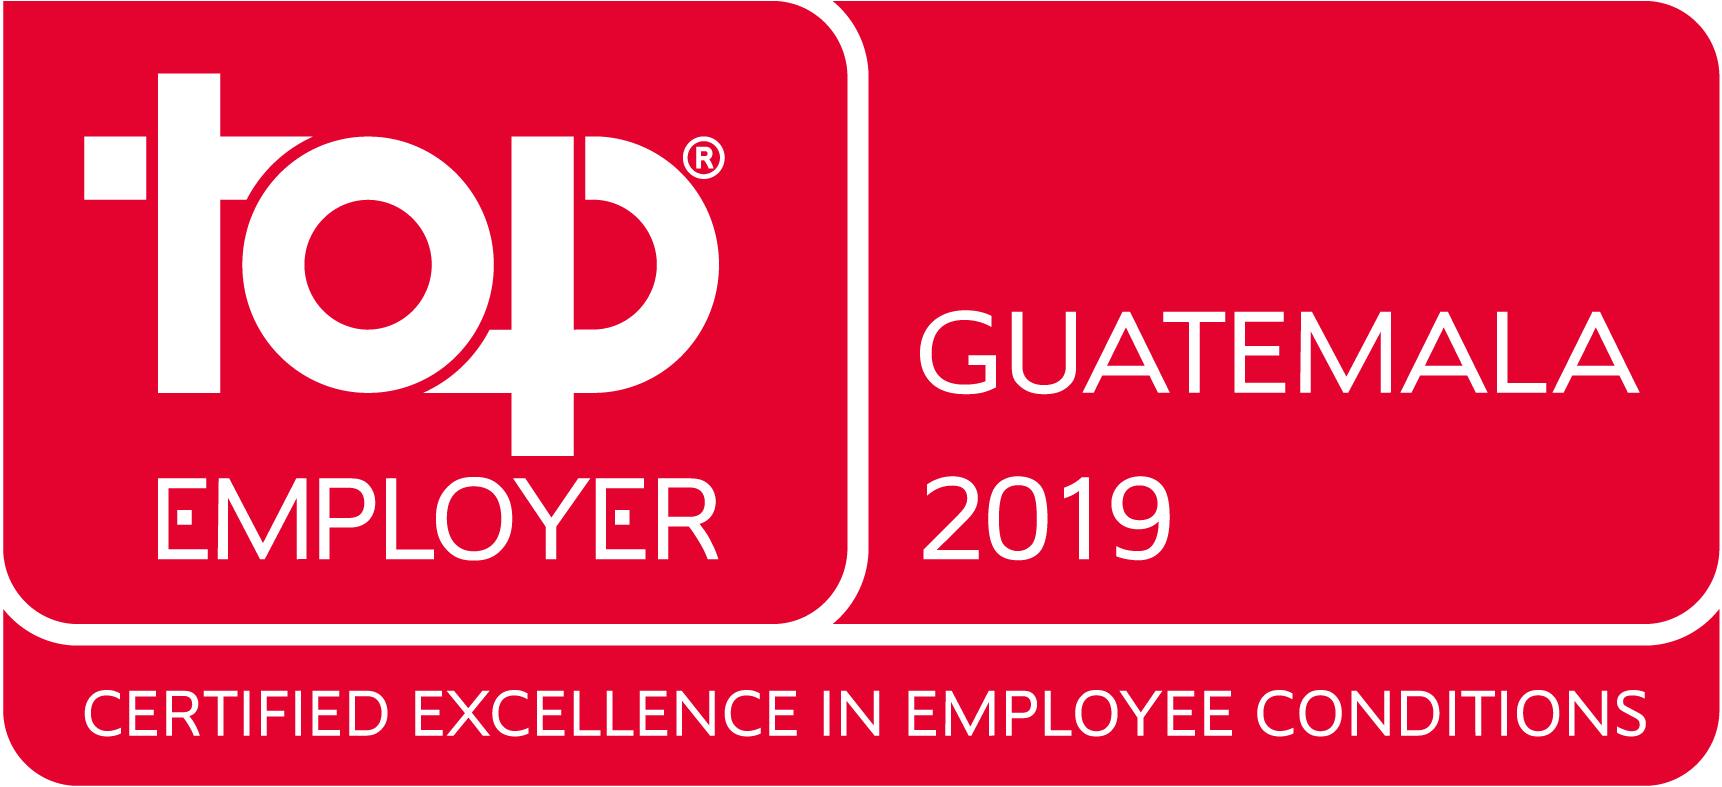 Top_Employer_Guatemala_2019